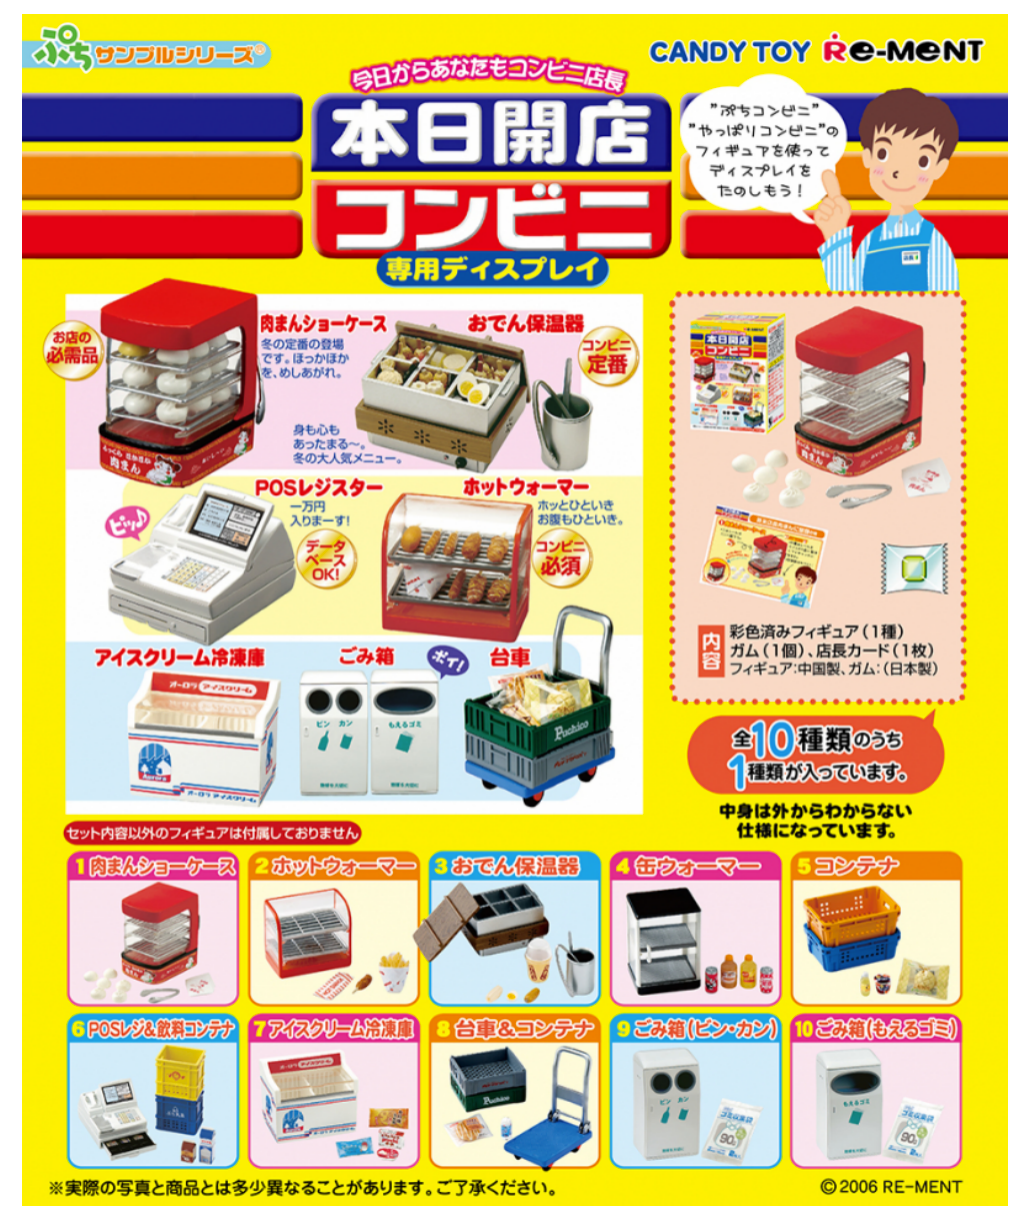 v2 a69ed88a628c48208b05647f17e7836e img 000 - 日本食玩市场观察:年收入480亿日元,万代24年卖了26亿个